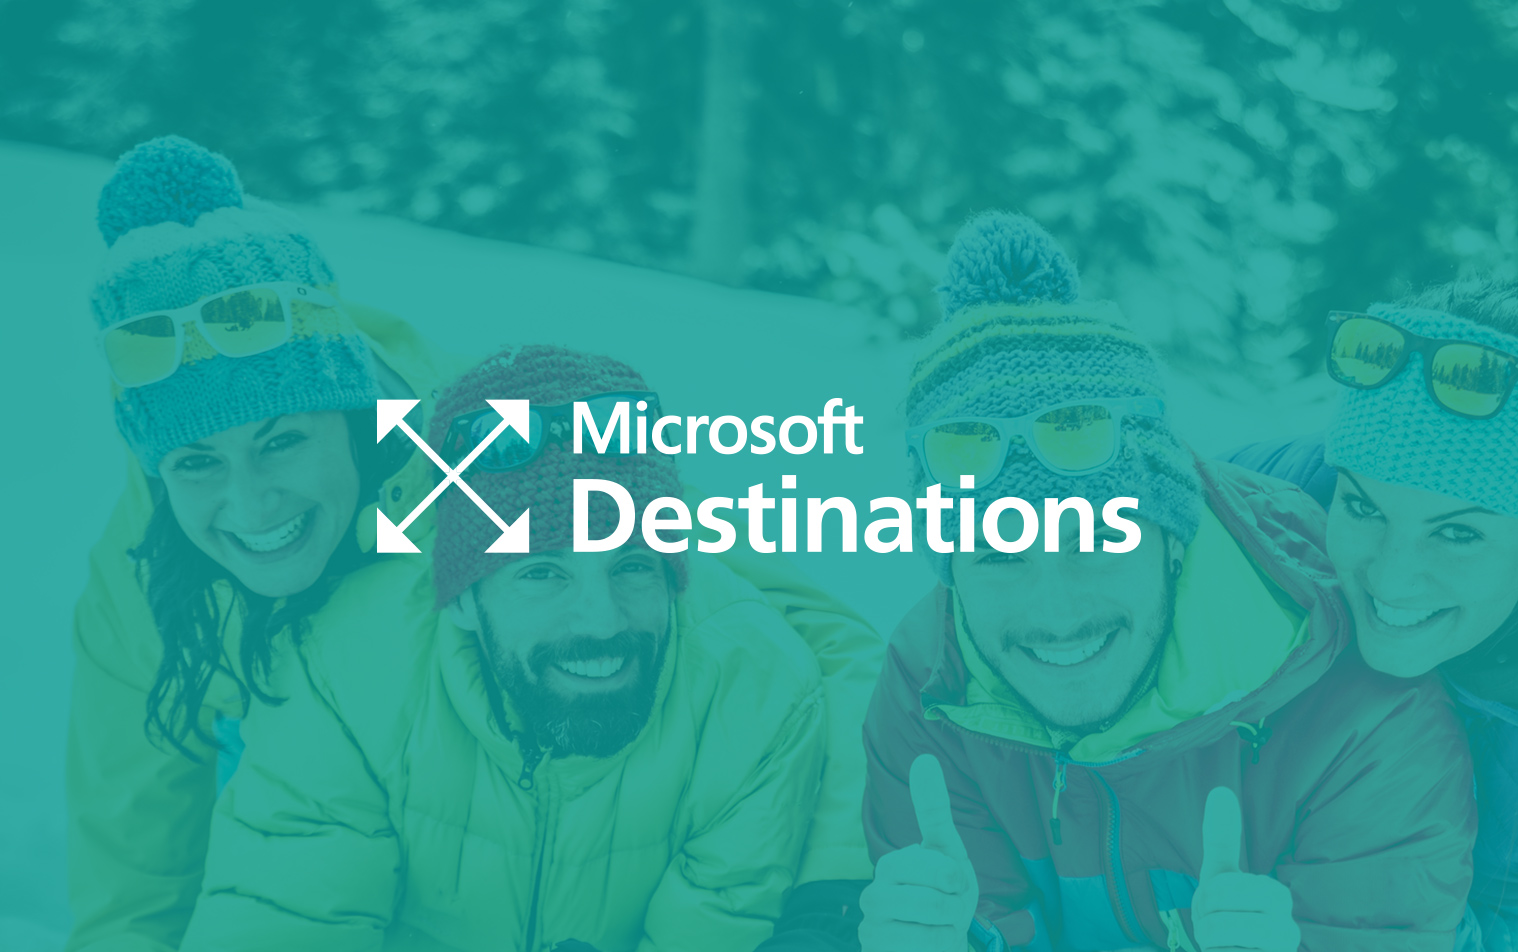 Microsoft Destinations